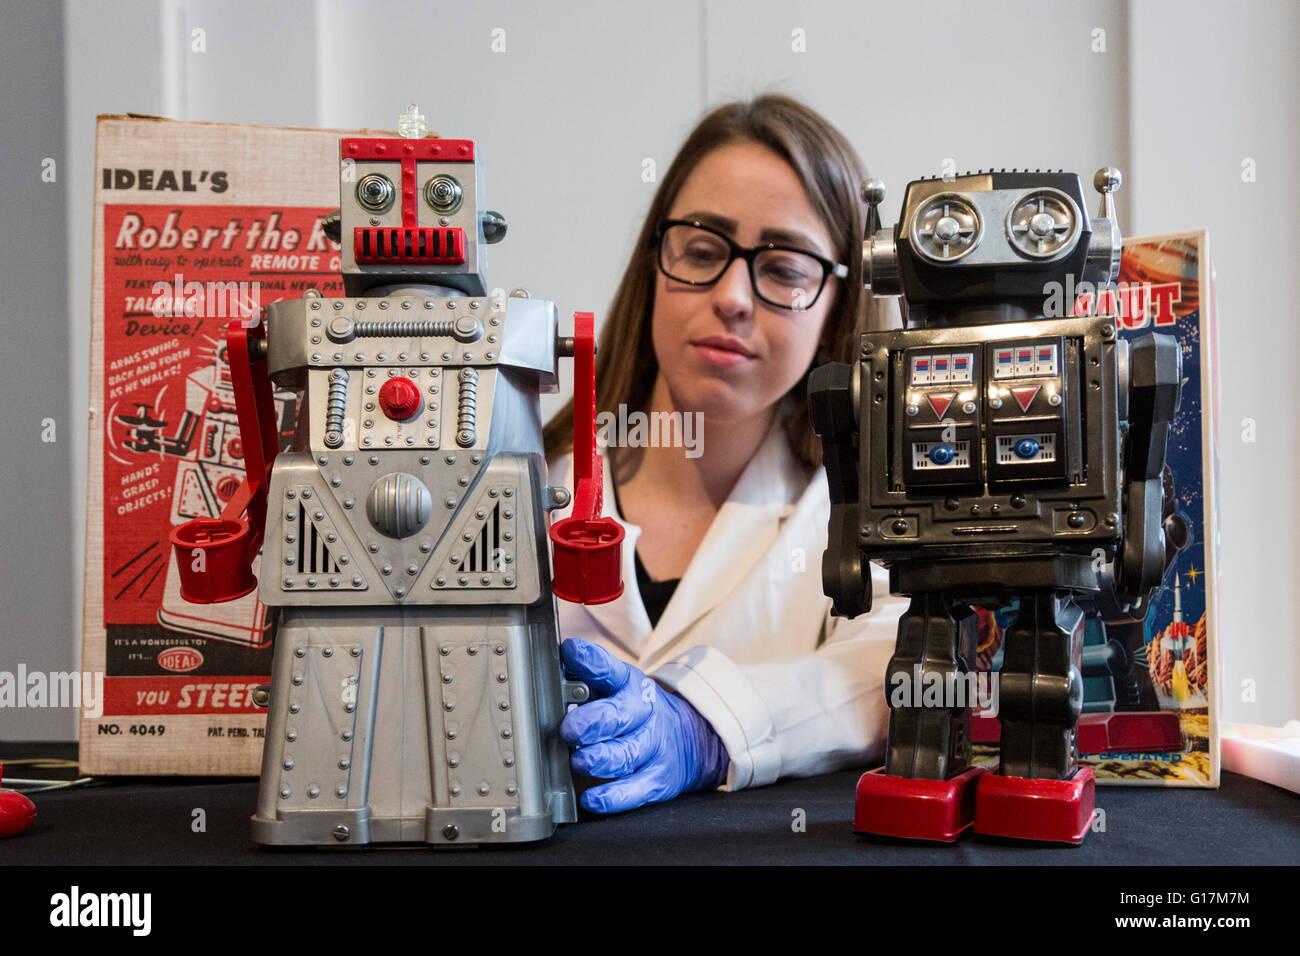 London, UK. 10. Mai 2016. Im Bild: Restaurator Vanessa Applebaum Spielzeugroboter Robert kümmert sich der Roboter Stockbild